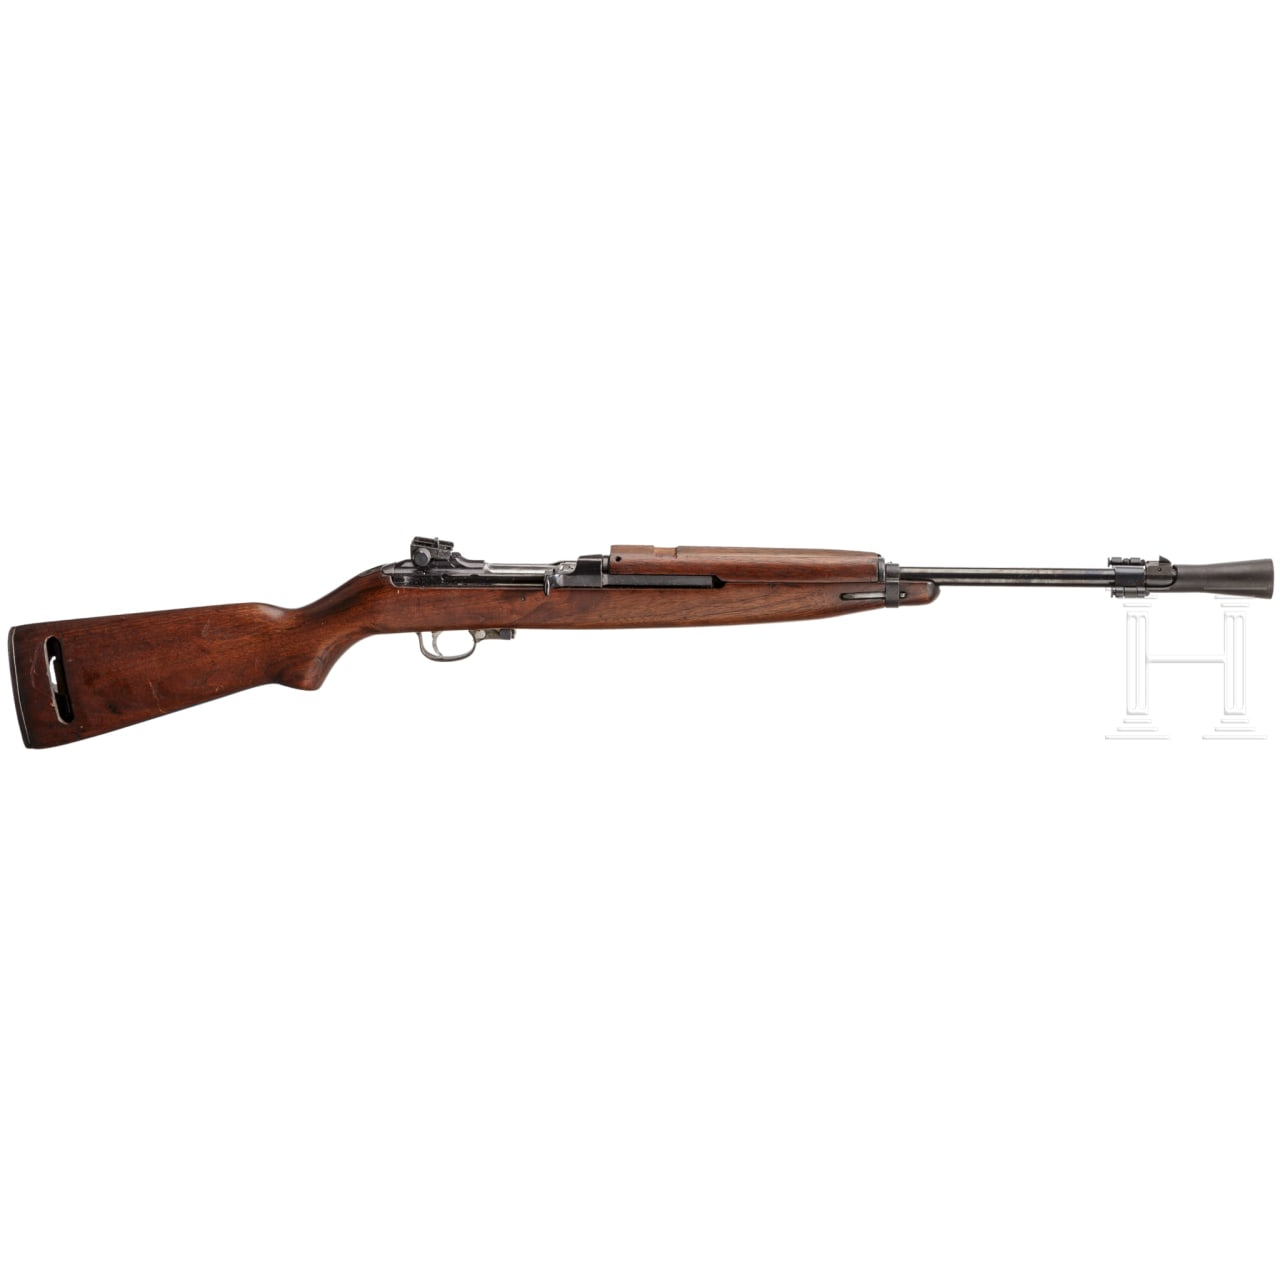 Carbine 30 M 1, Underwood